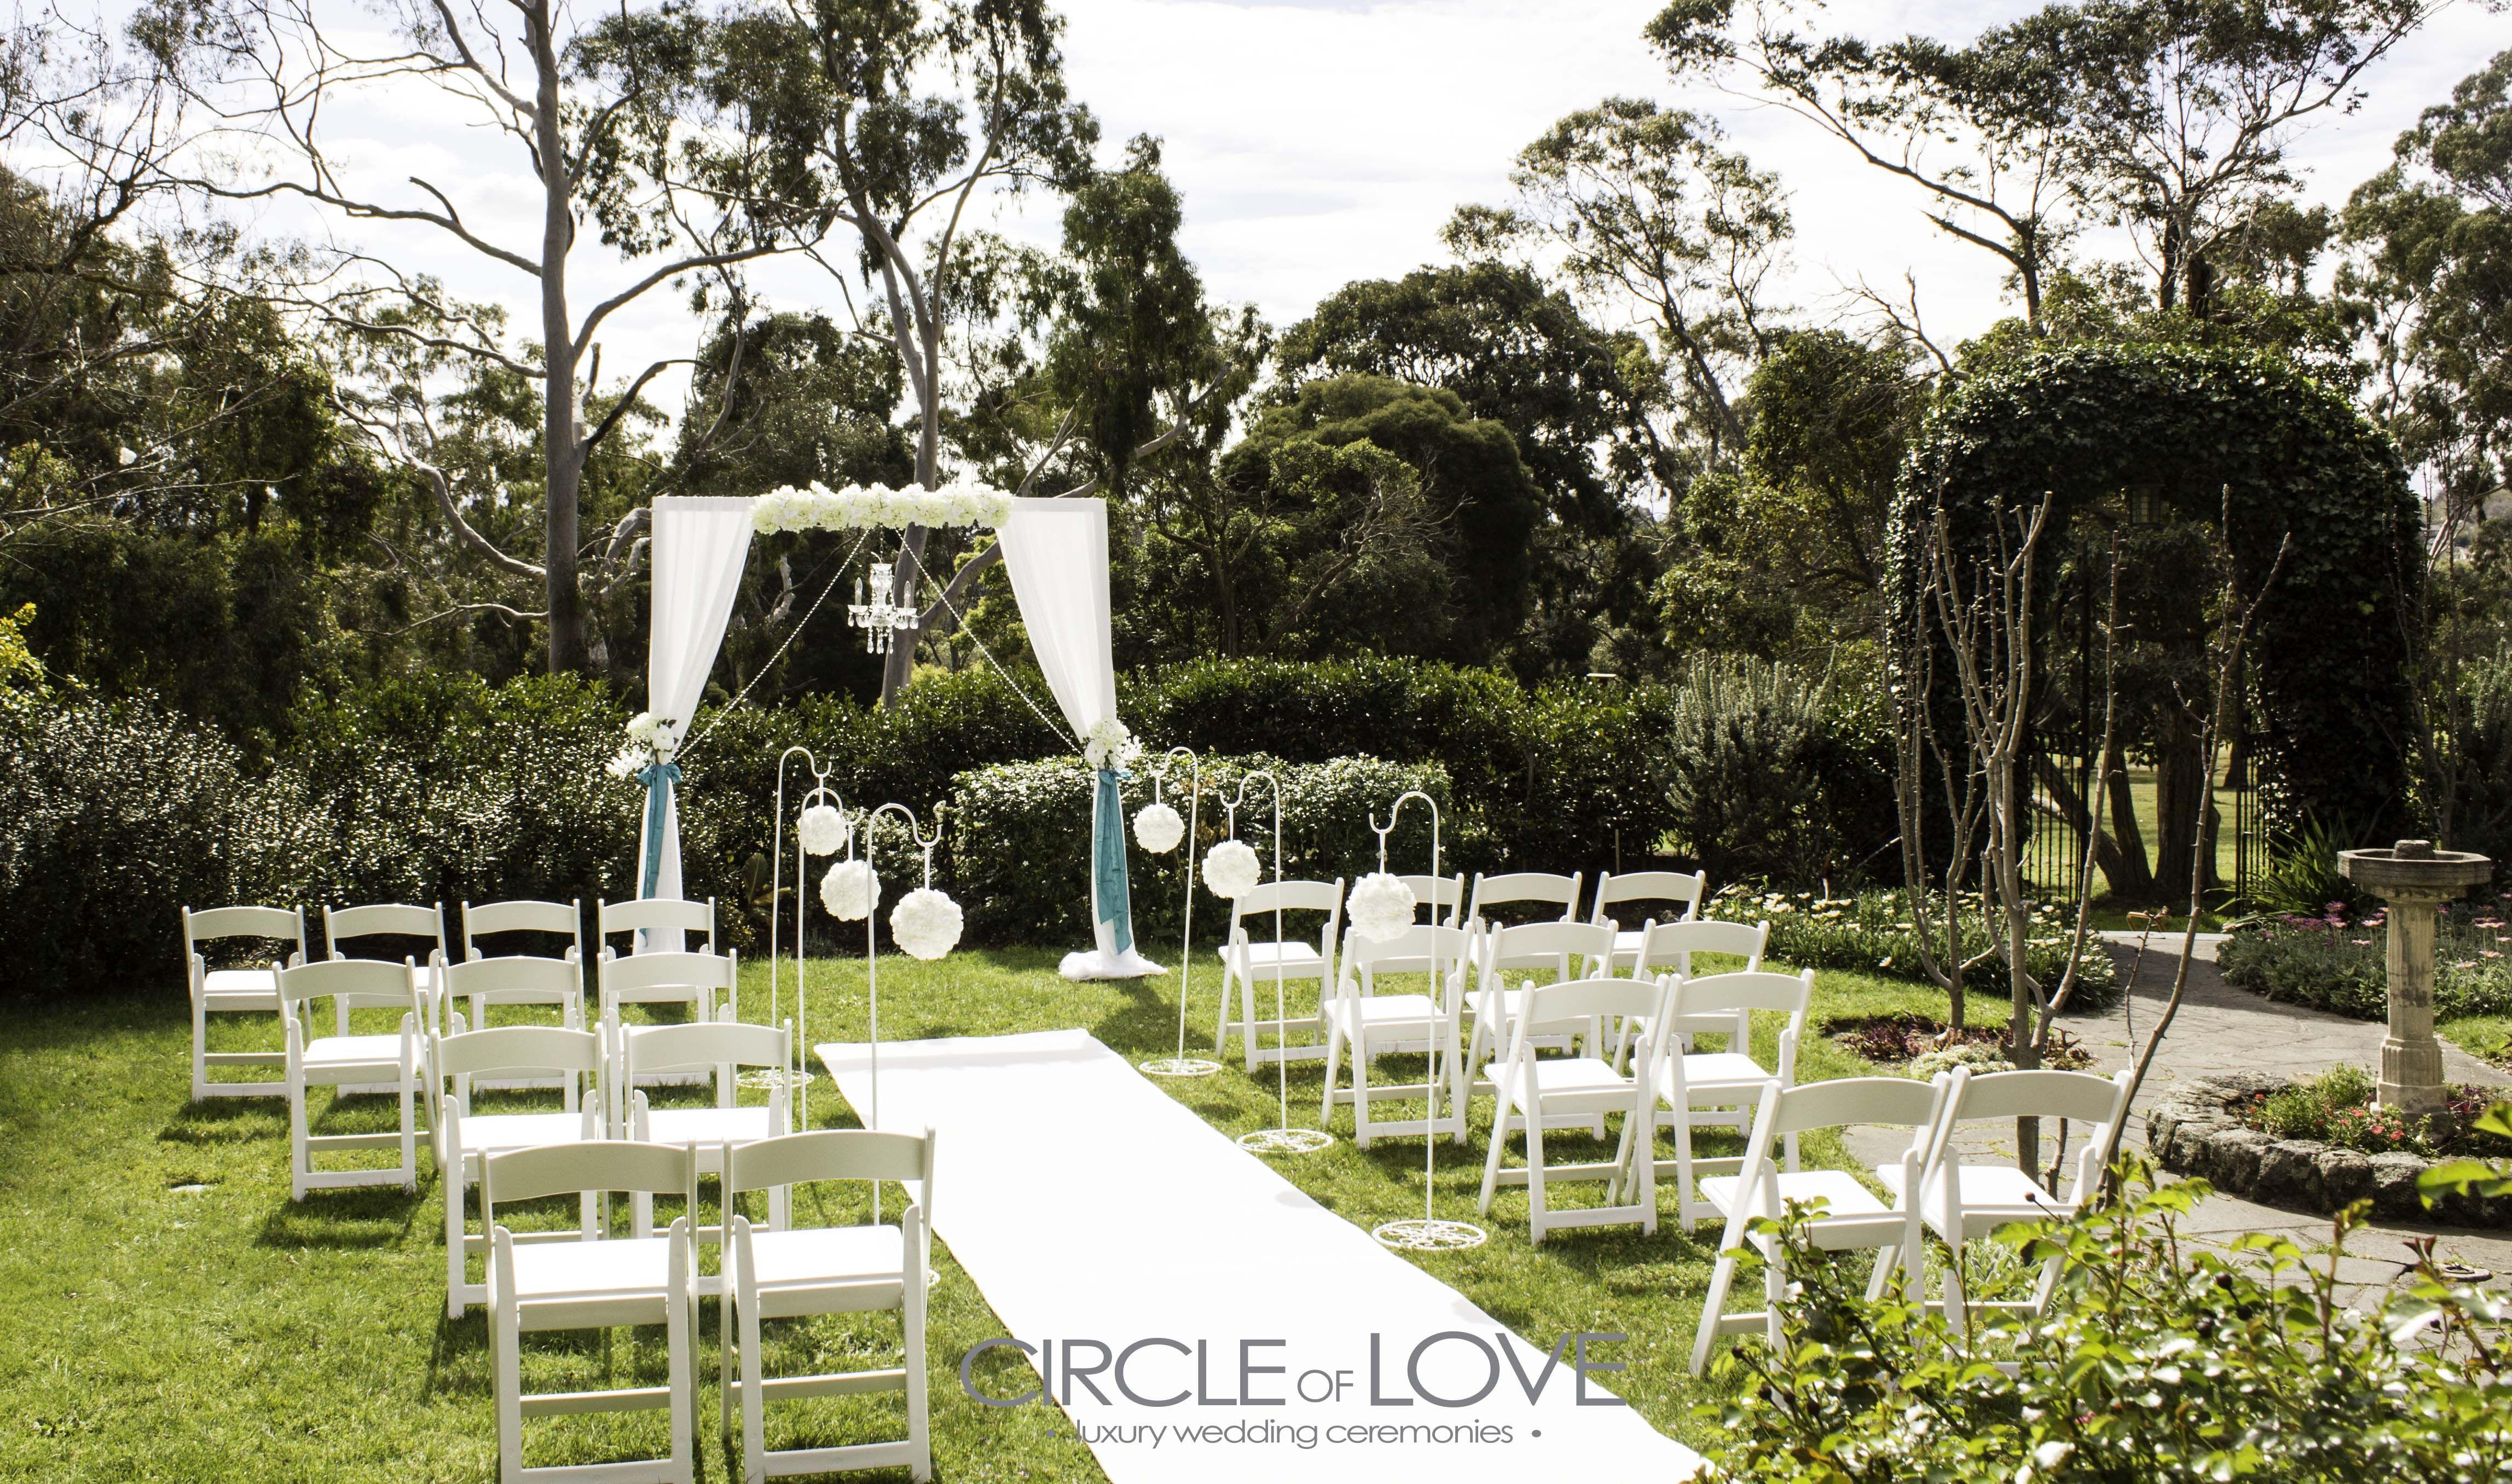 garden party wedding venues melbourne%0A Wattle Park Chalet  Wedding locations Melbourne  www circleofloveweddings com au